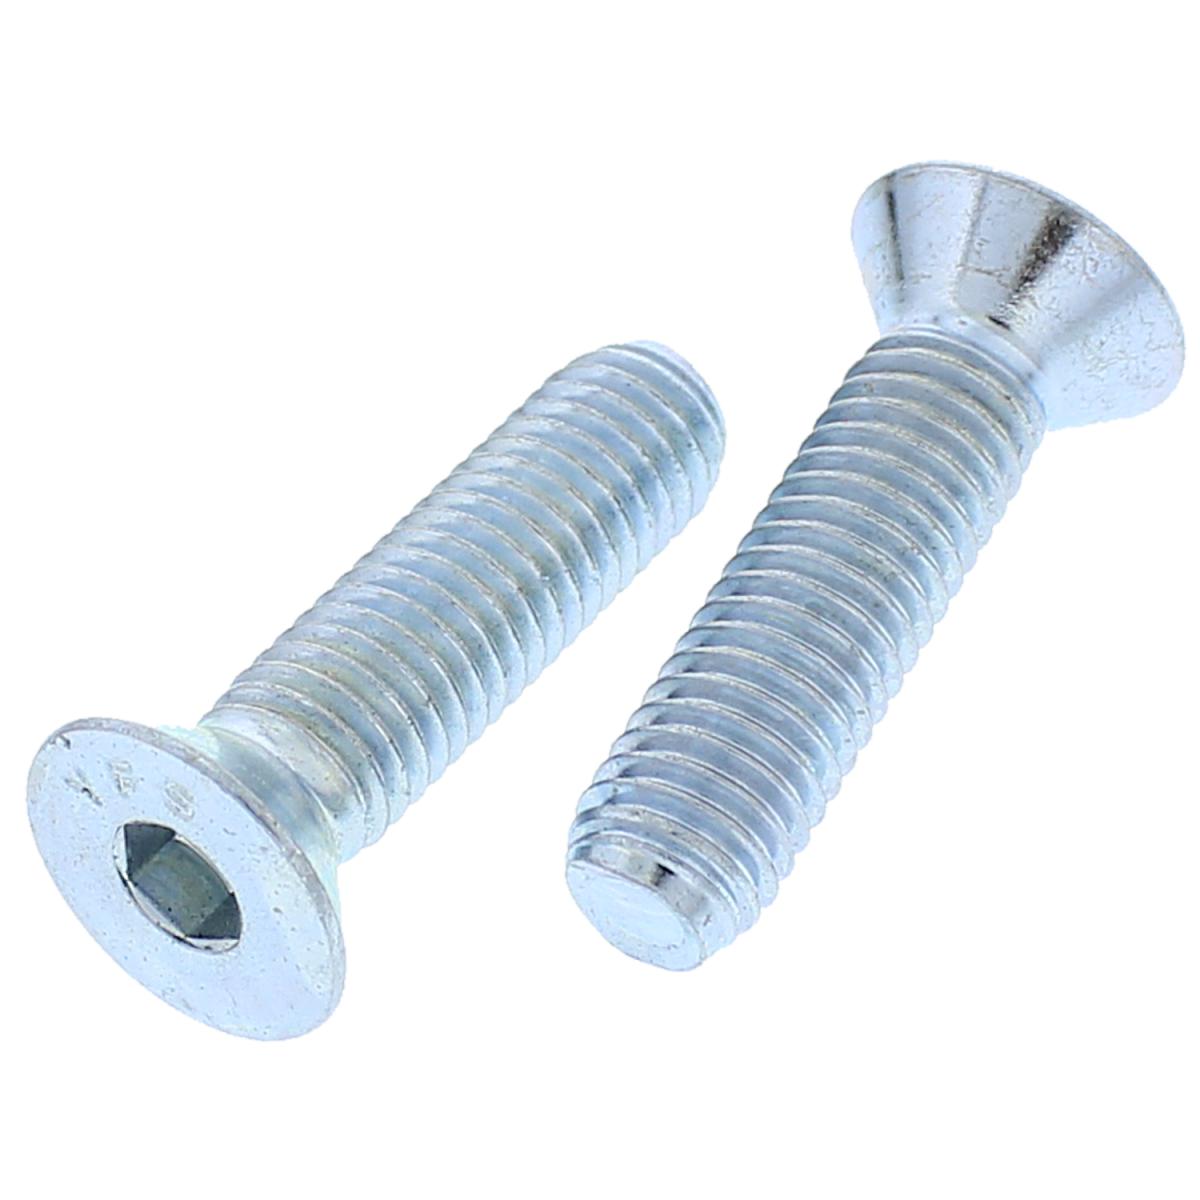 "#10-24 x 1/2"" Flat Head Socket Cap Screws — Alloy Steel Heat Treated, Coarse Thread, Zinc, 100/PKG"